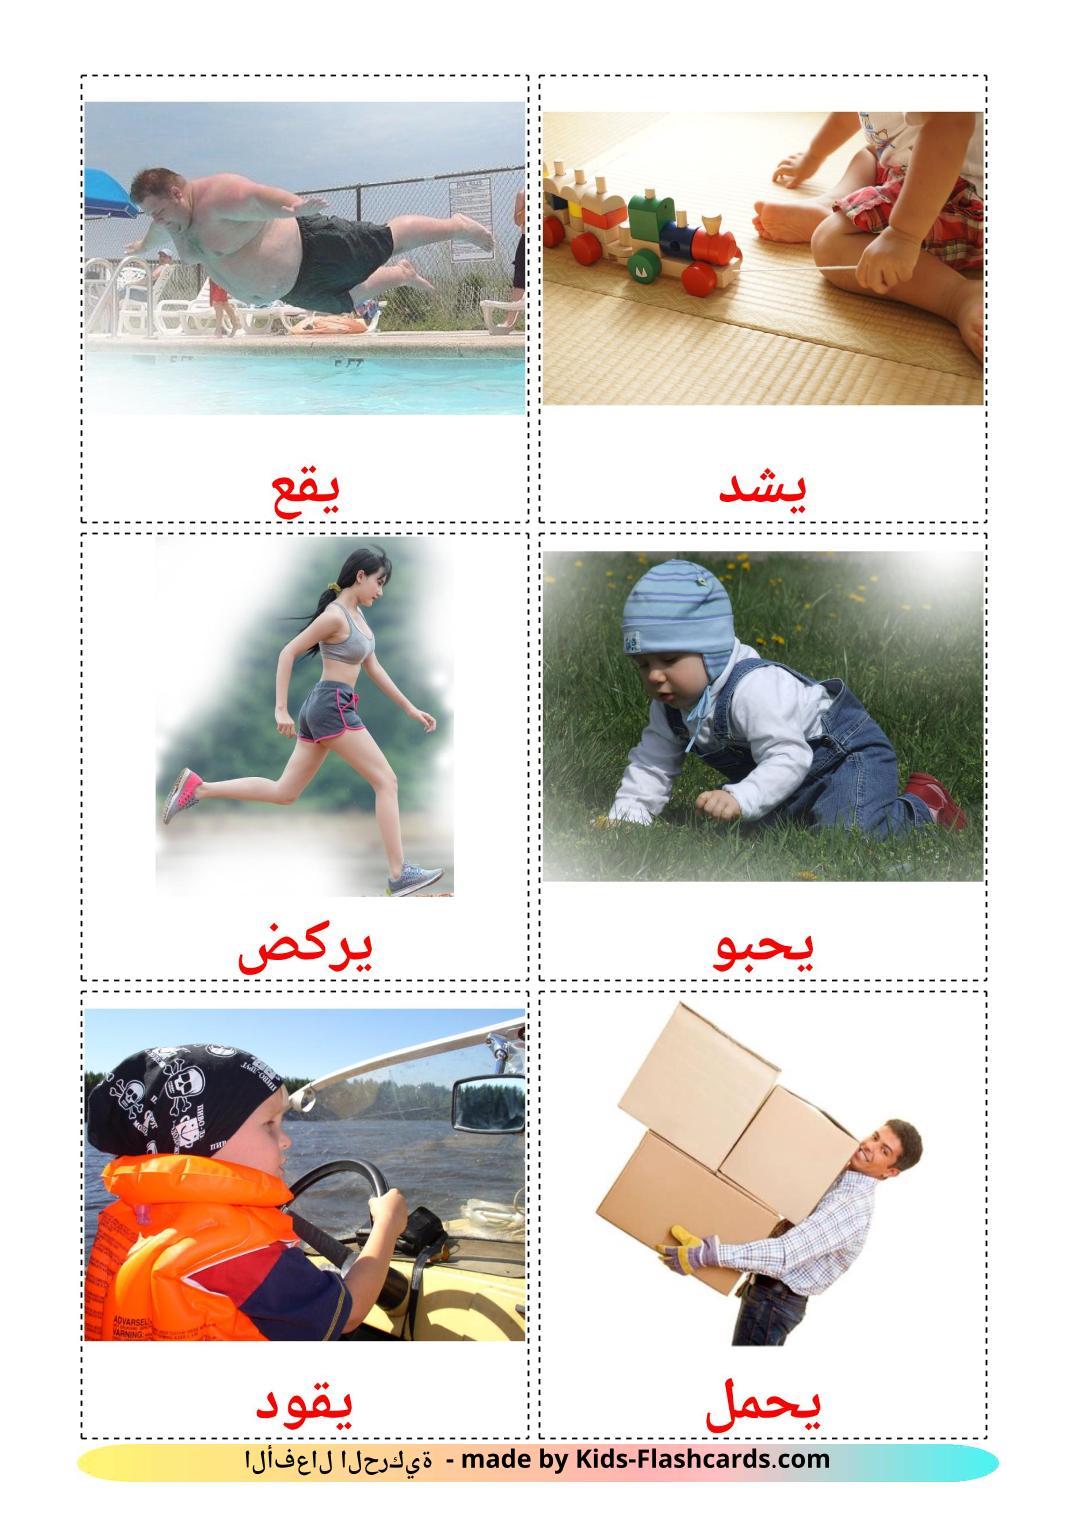 Movement verbs - 22 Free Printable arabic Flashcards